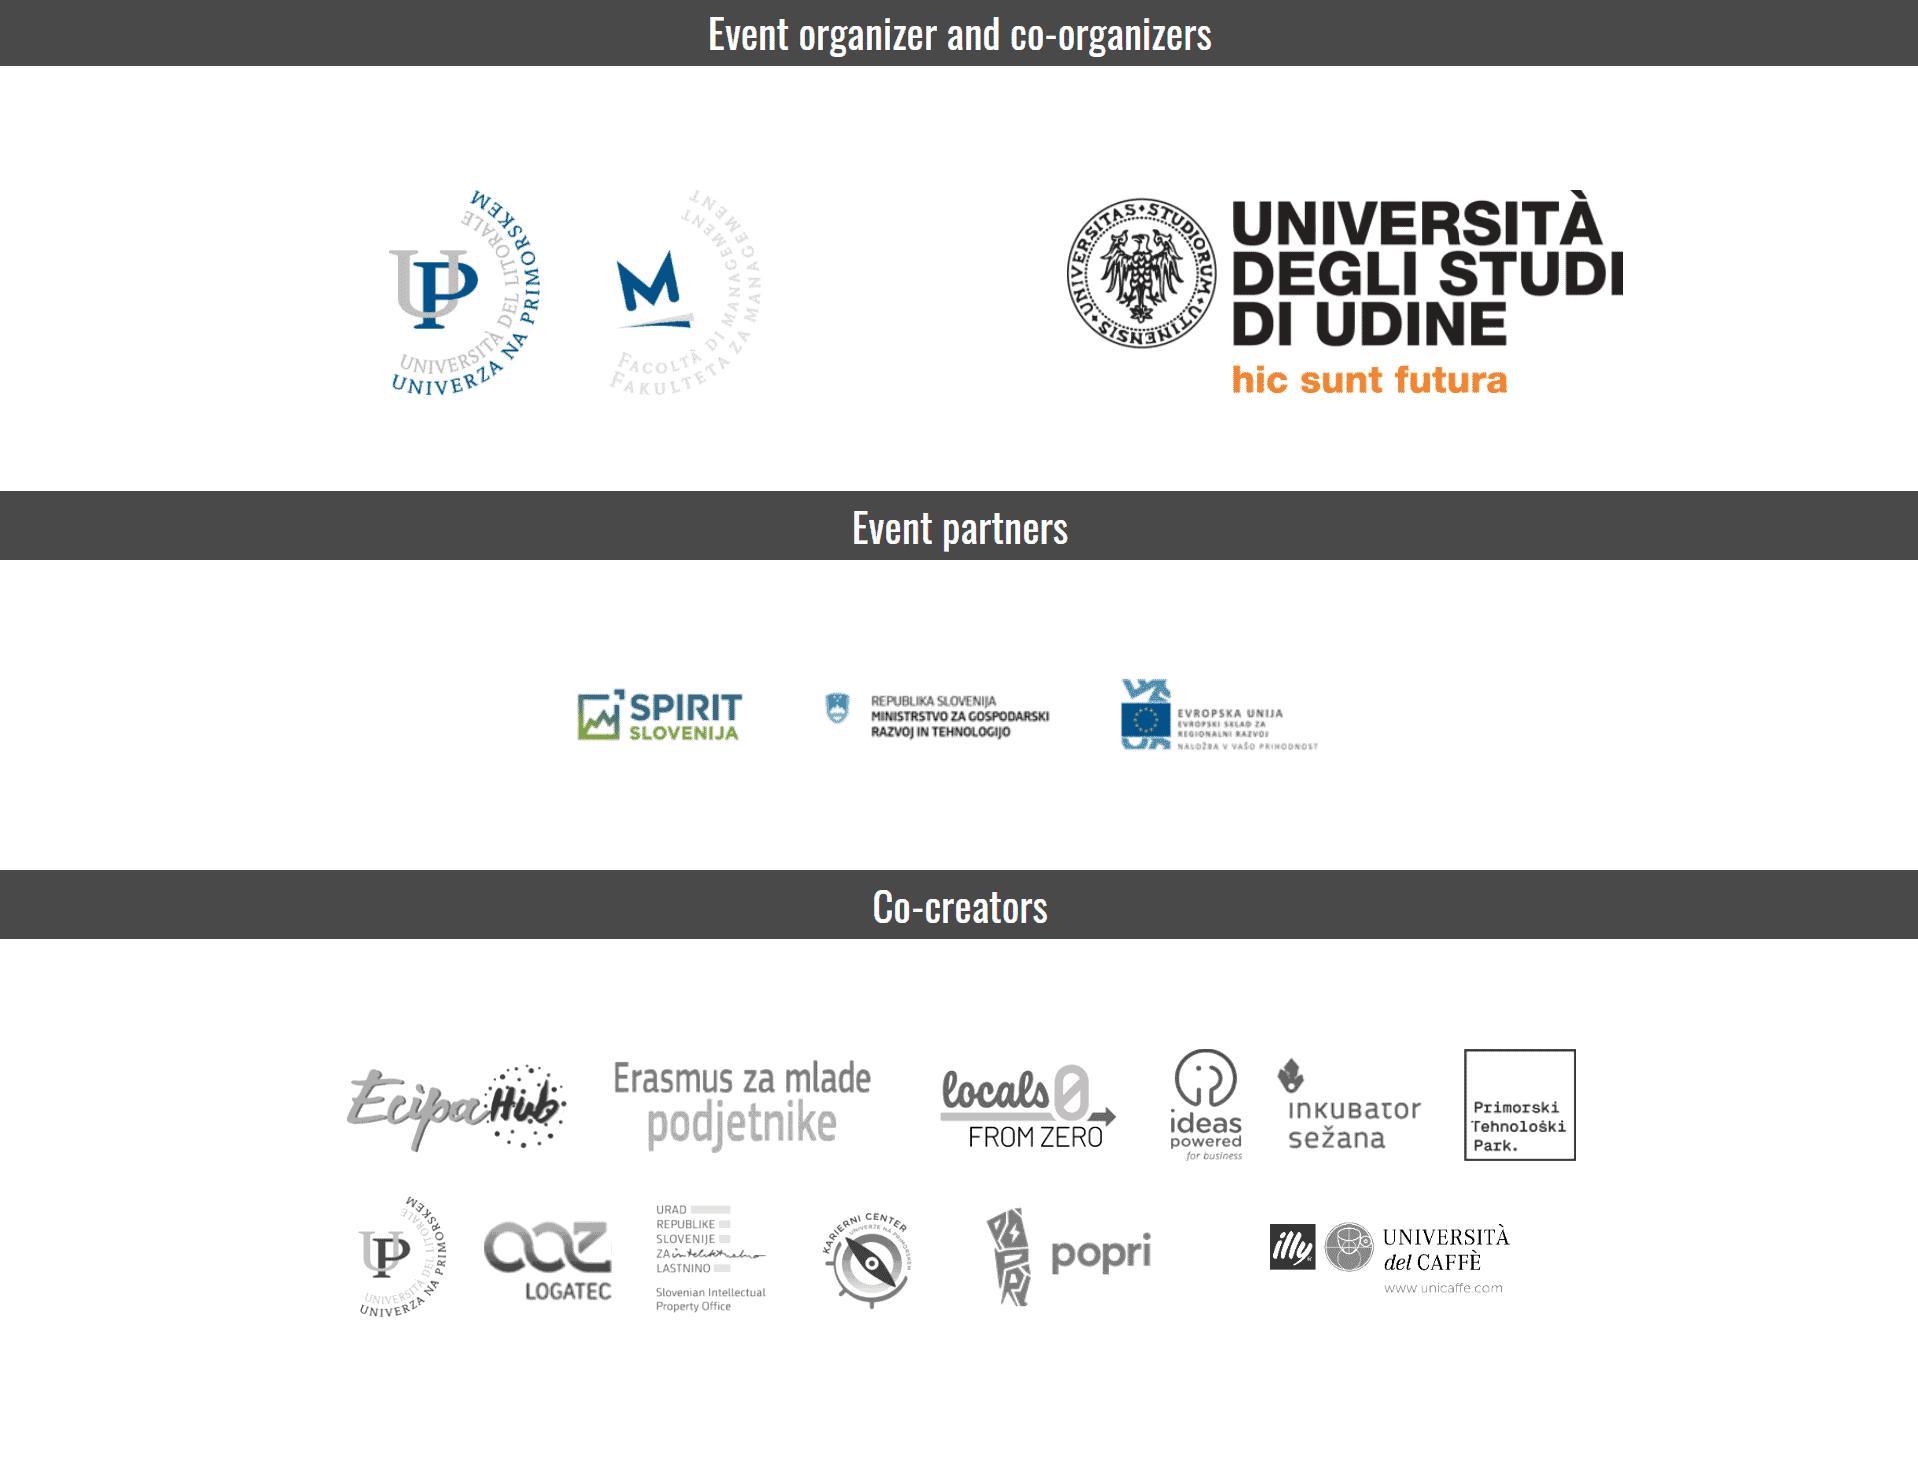 Online FestINNO 2021 Partners